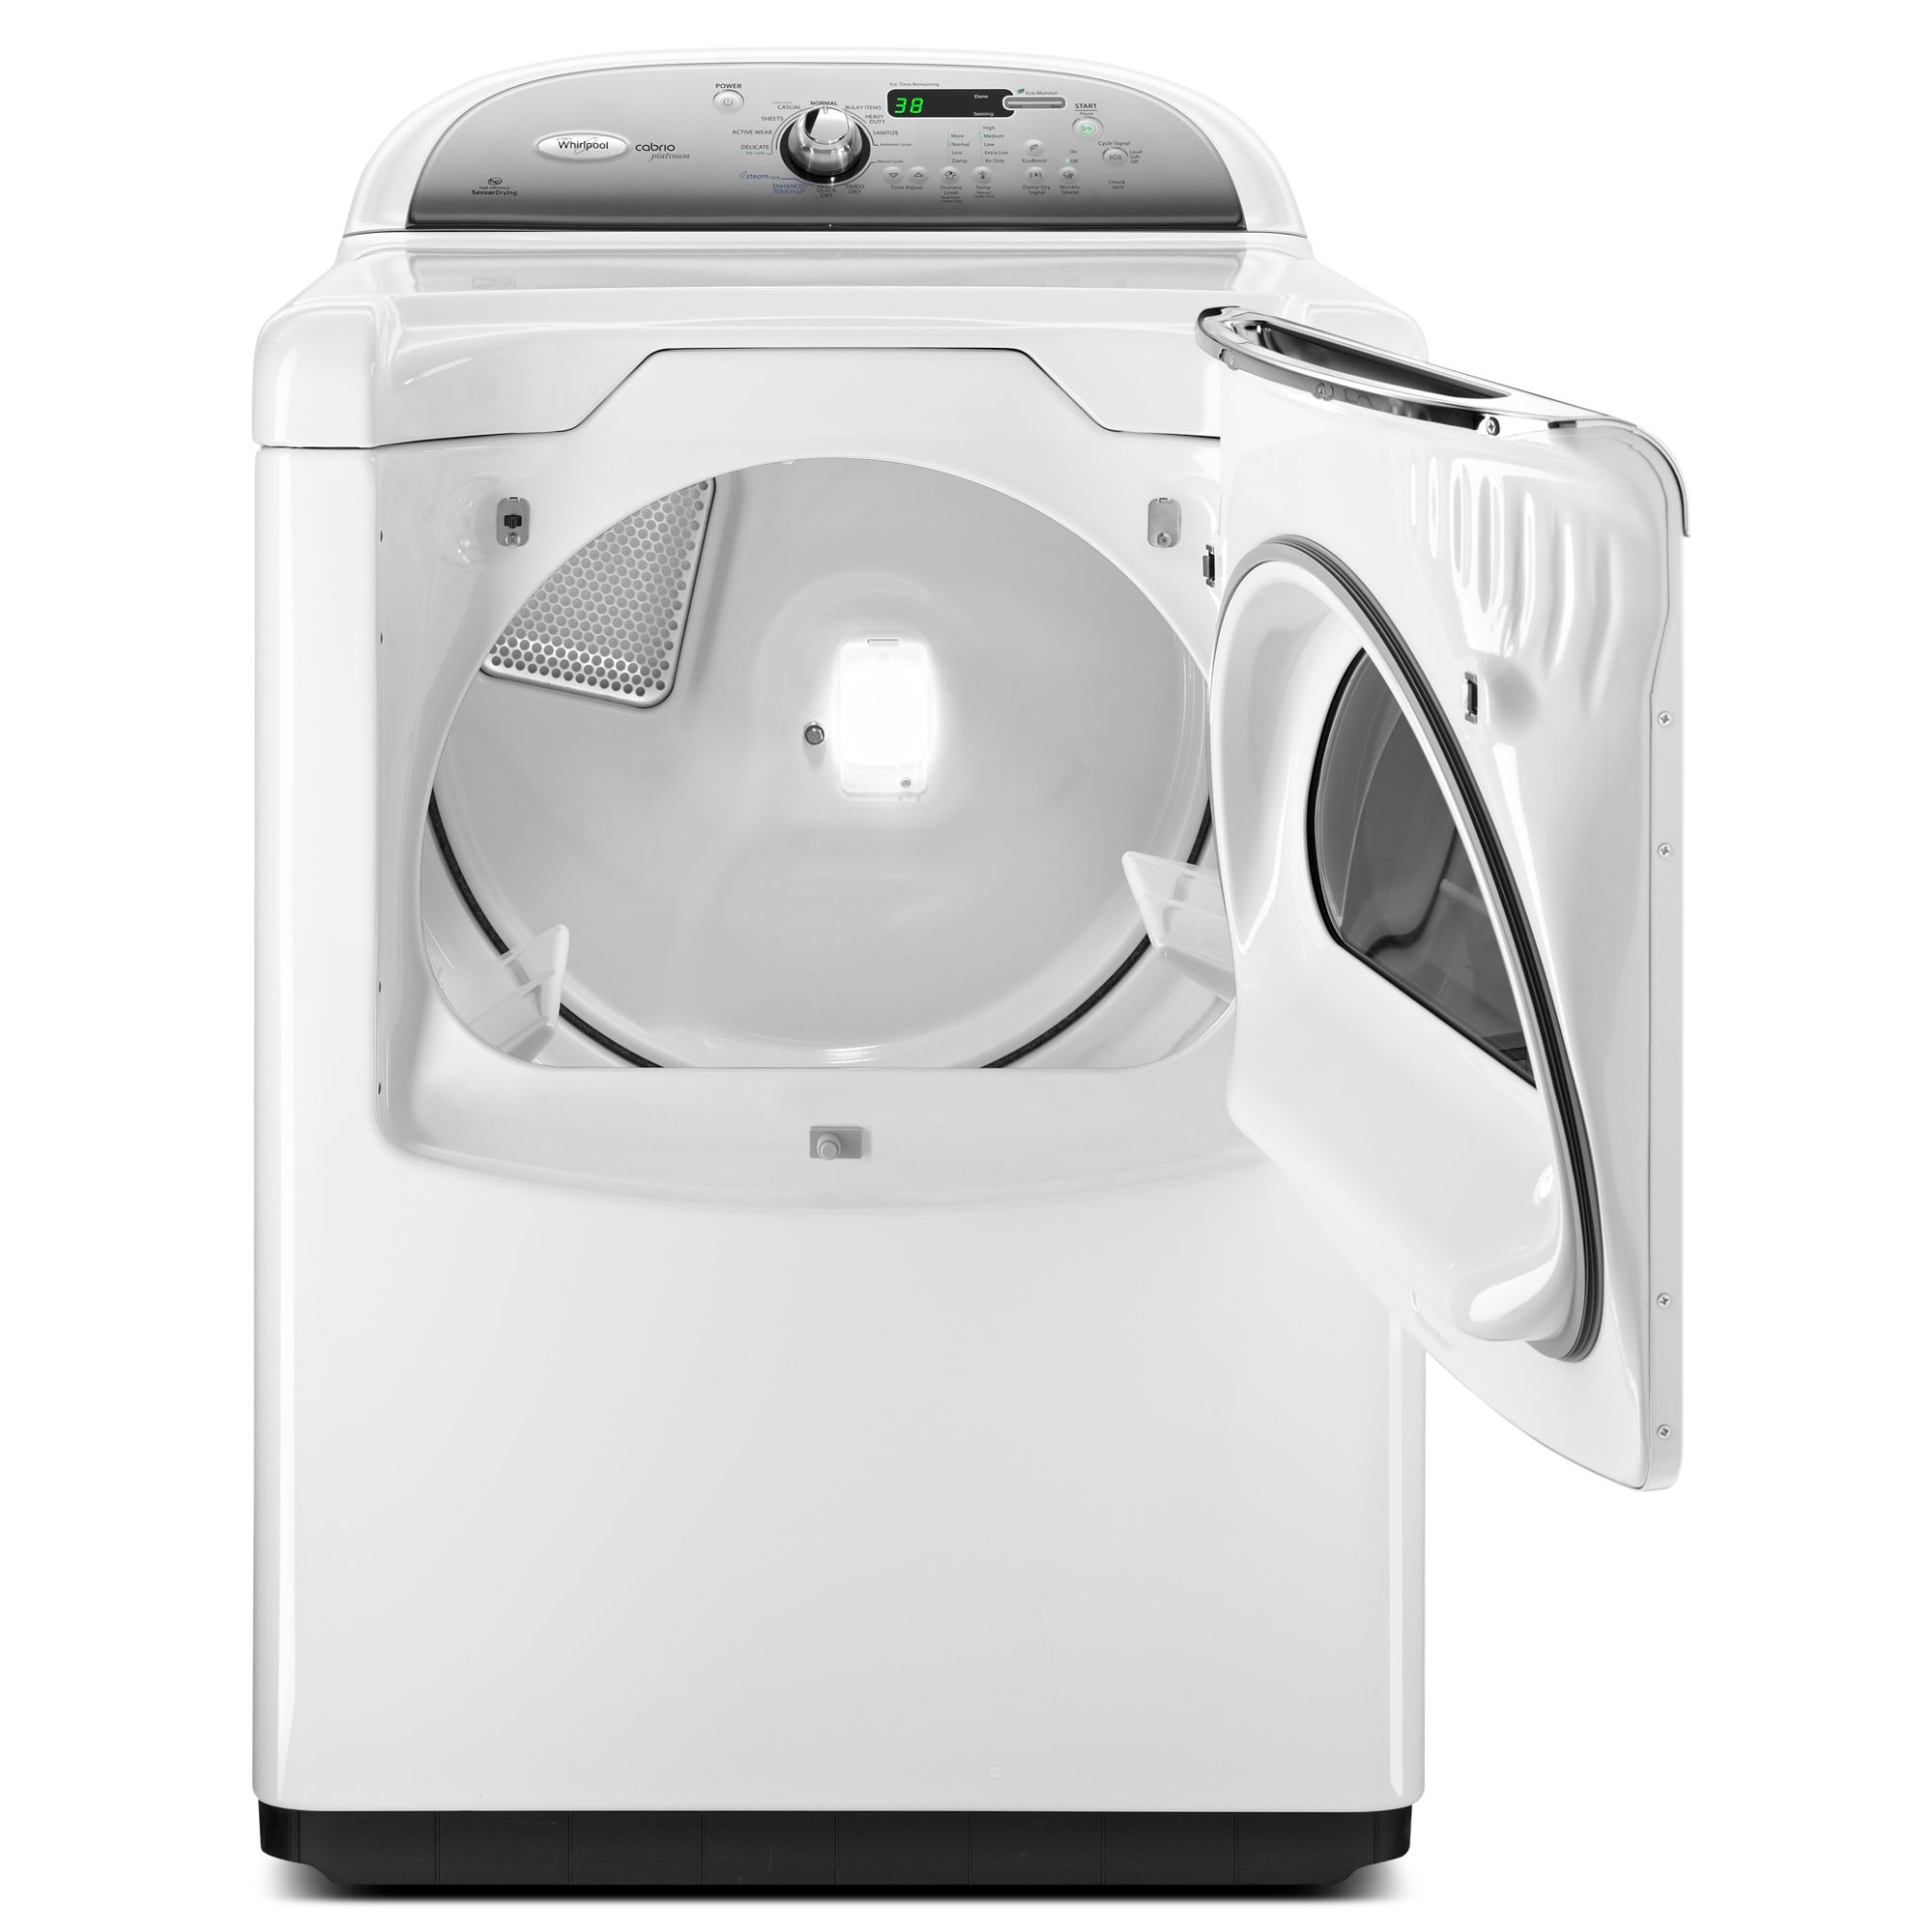 Whirlpool 7.6 cu. ft. Steam Gas Dryer - White